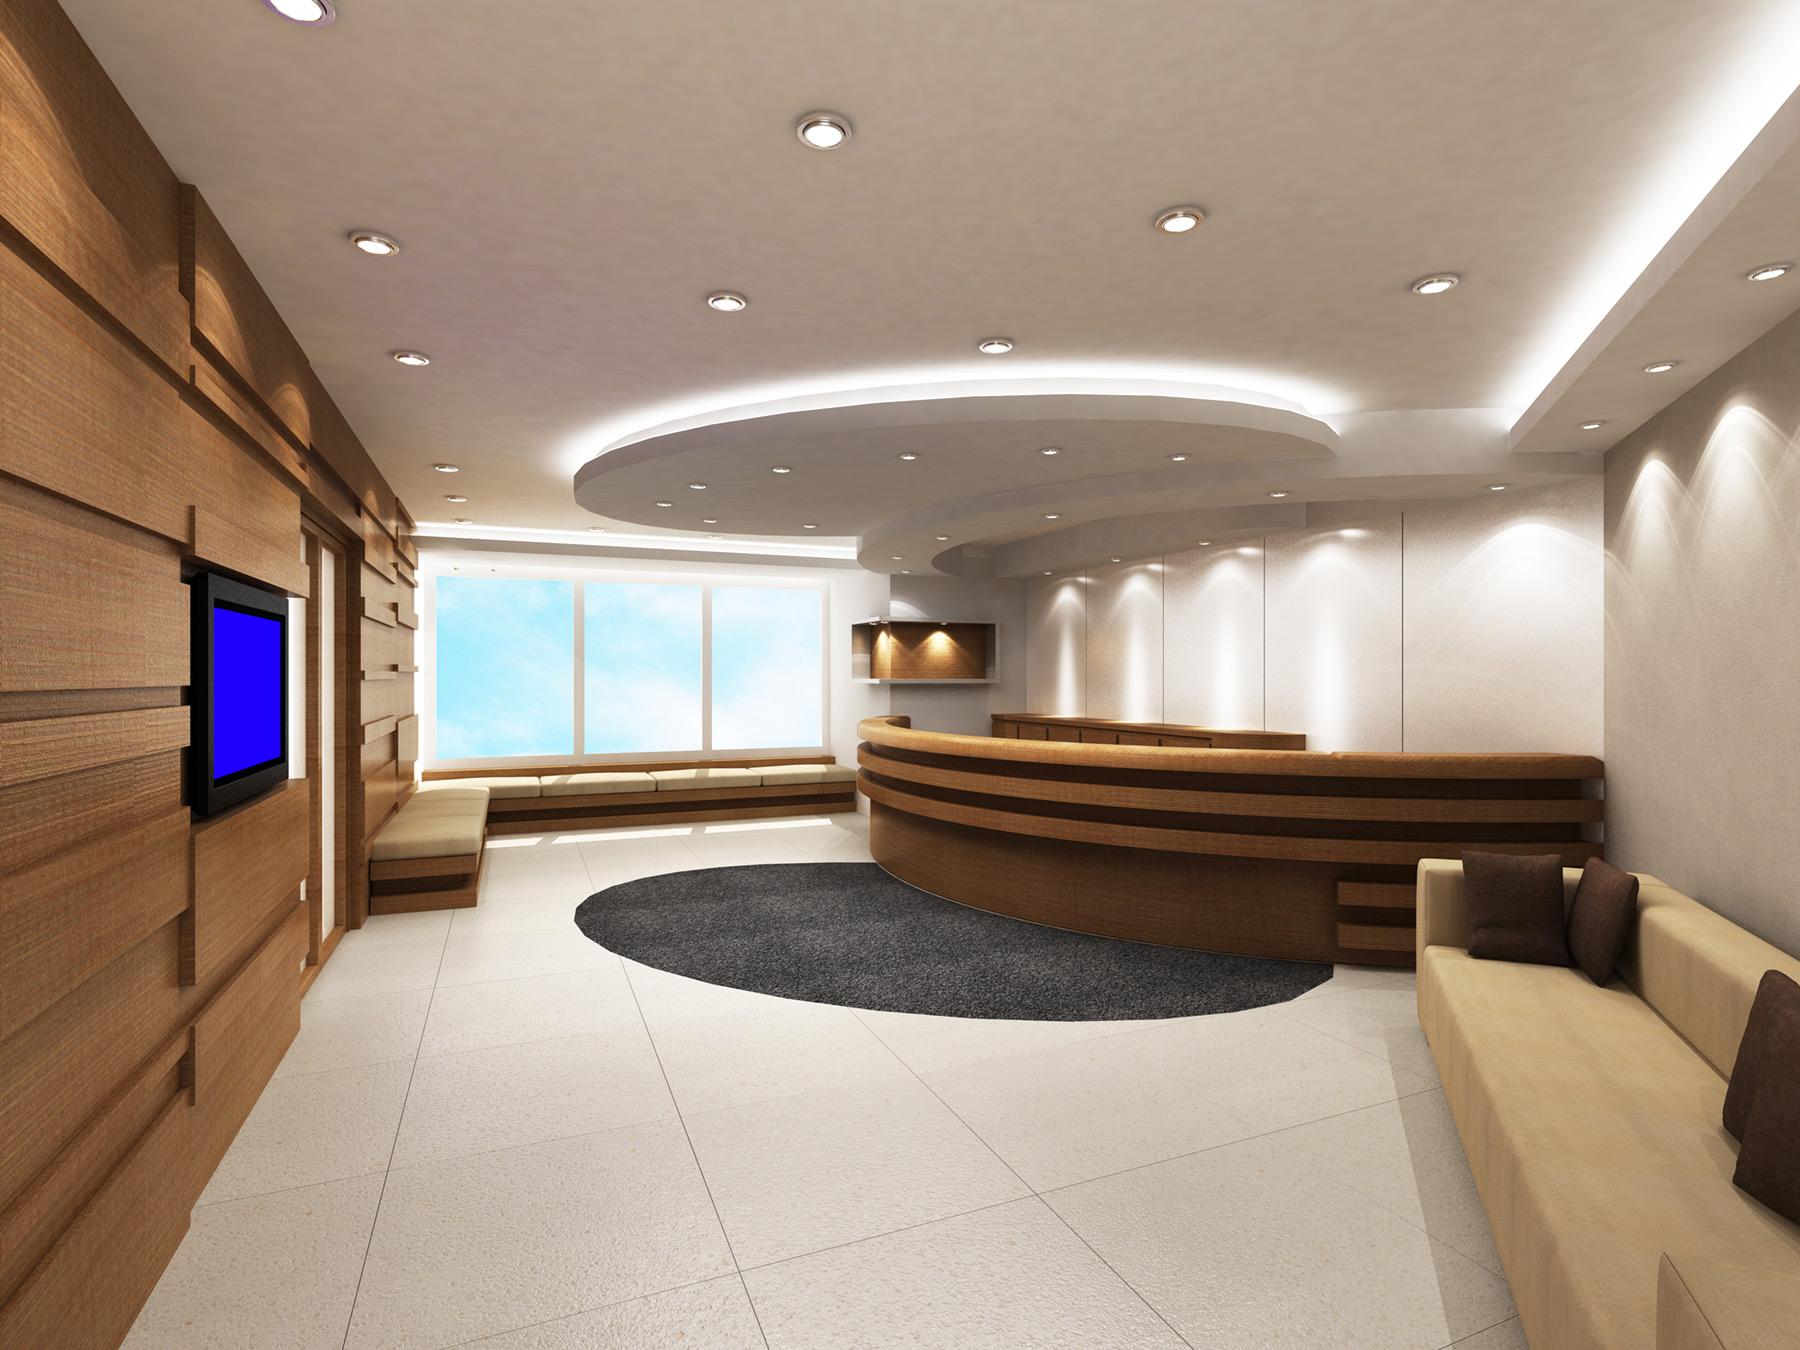 Arredamento ufficio roma la sala d 39 attesa sistema ufficio - Arredare la sala ...